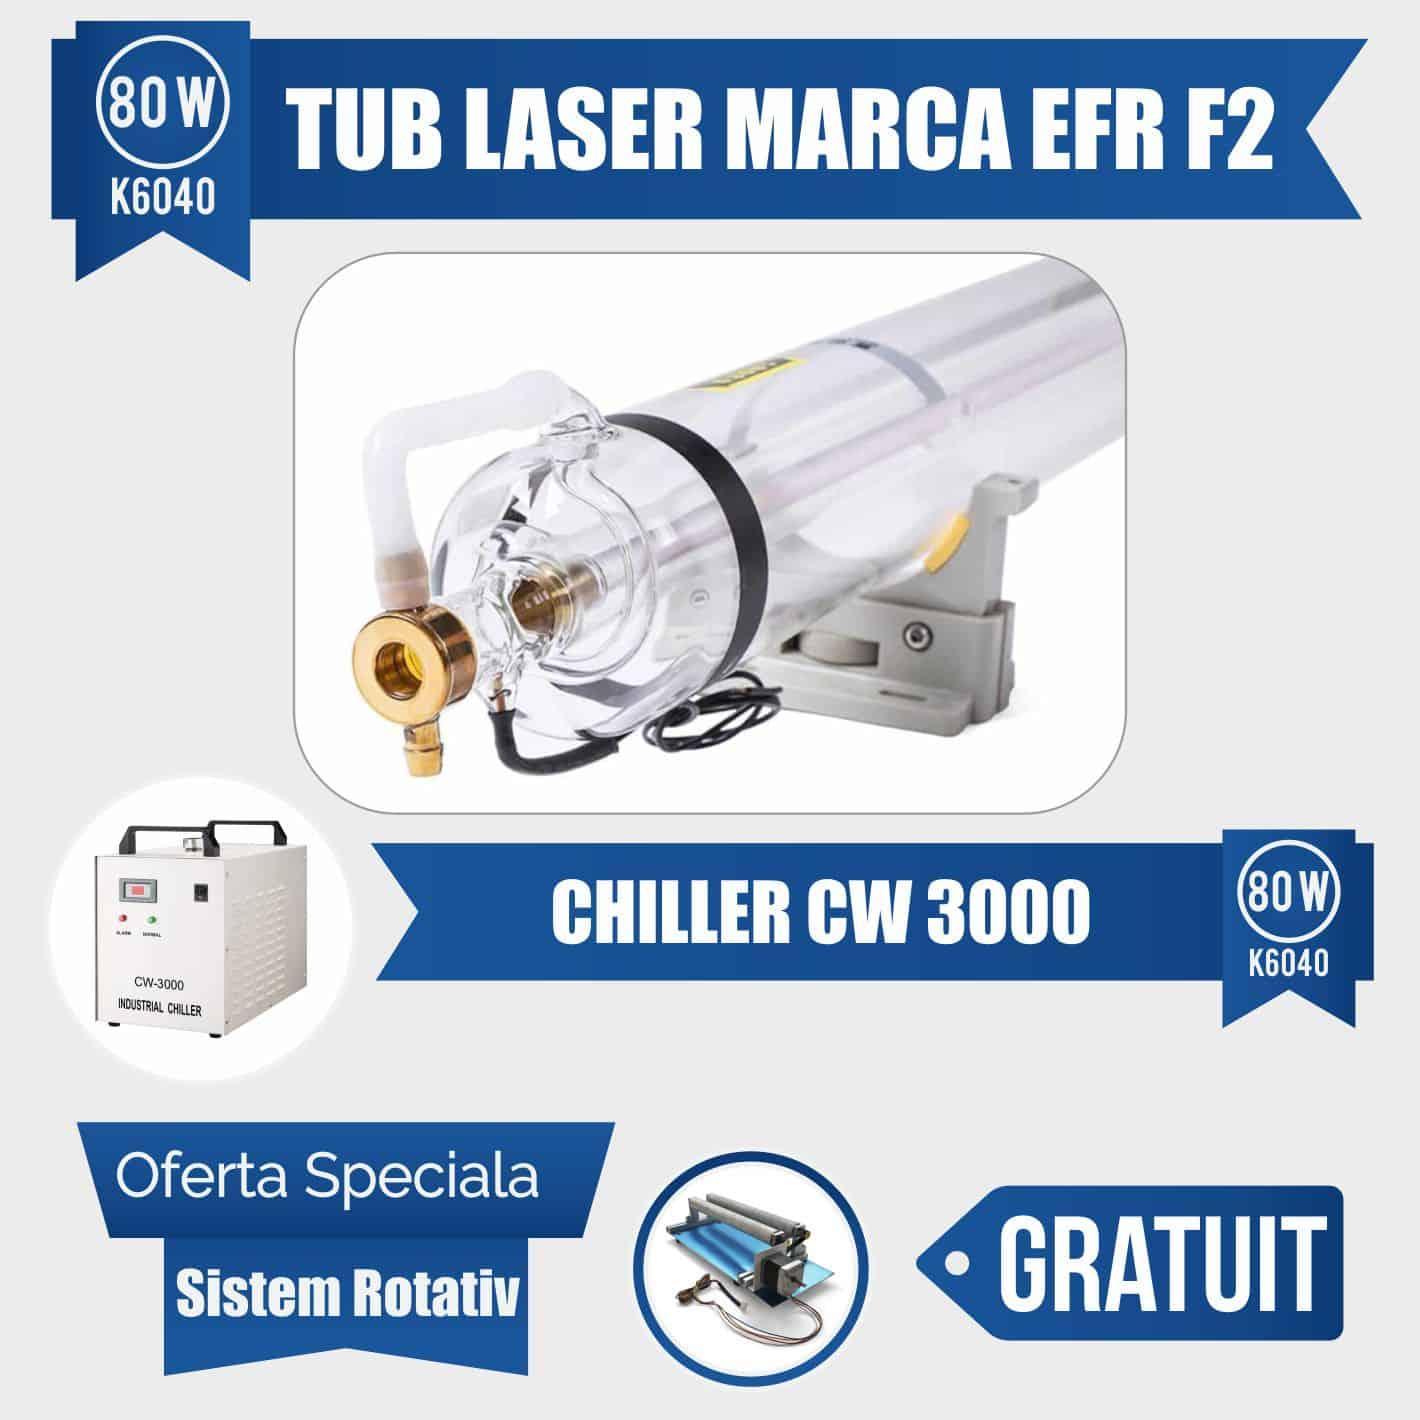 tub laser efr f2 k6040